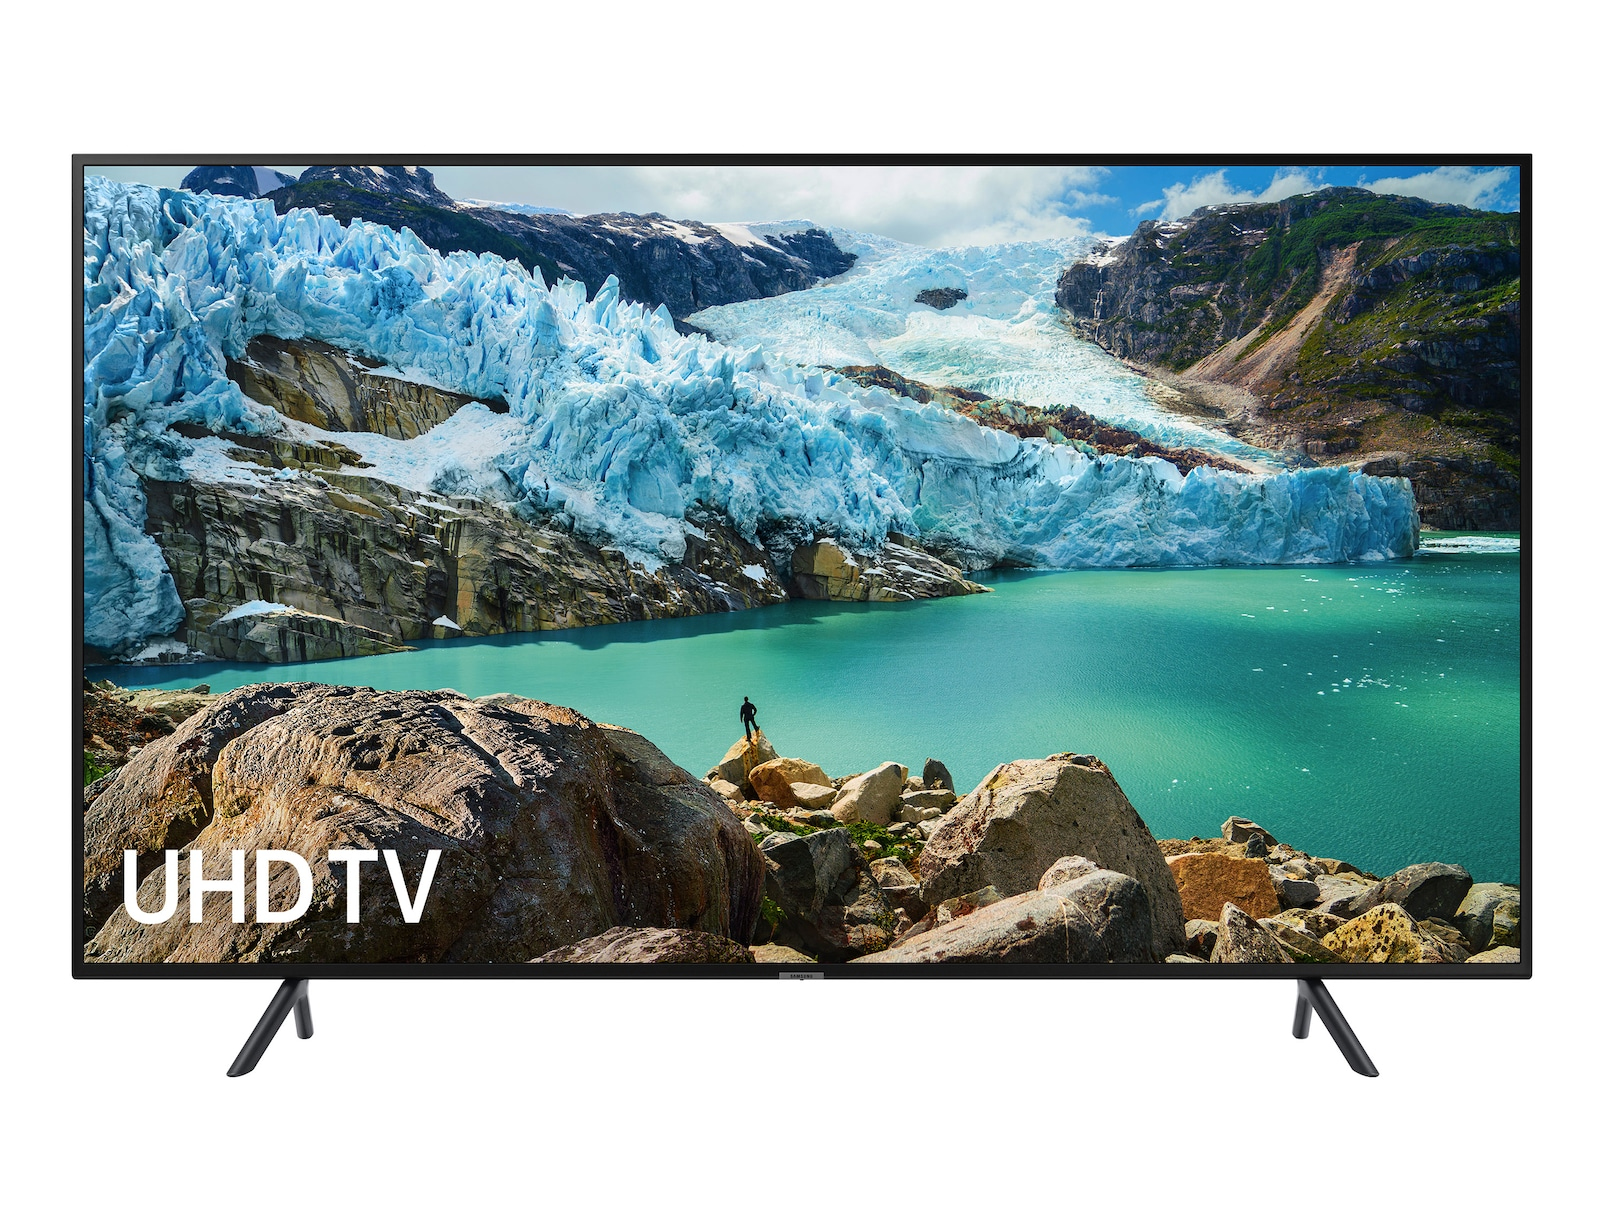 "Samsung UE43RU7100K - 43"" Class 7 Series LED TV - Smart TV - 4K UHD (2160p) 3840 x 2160 - HDR - UHD"